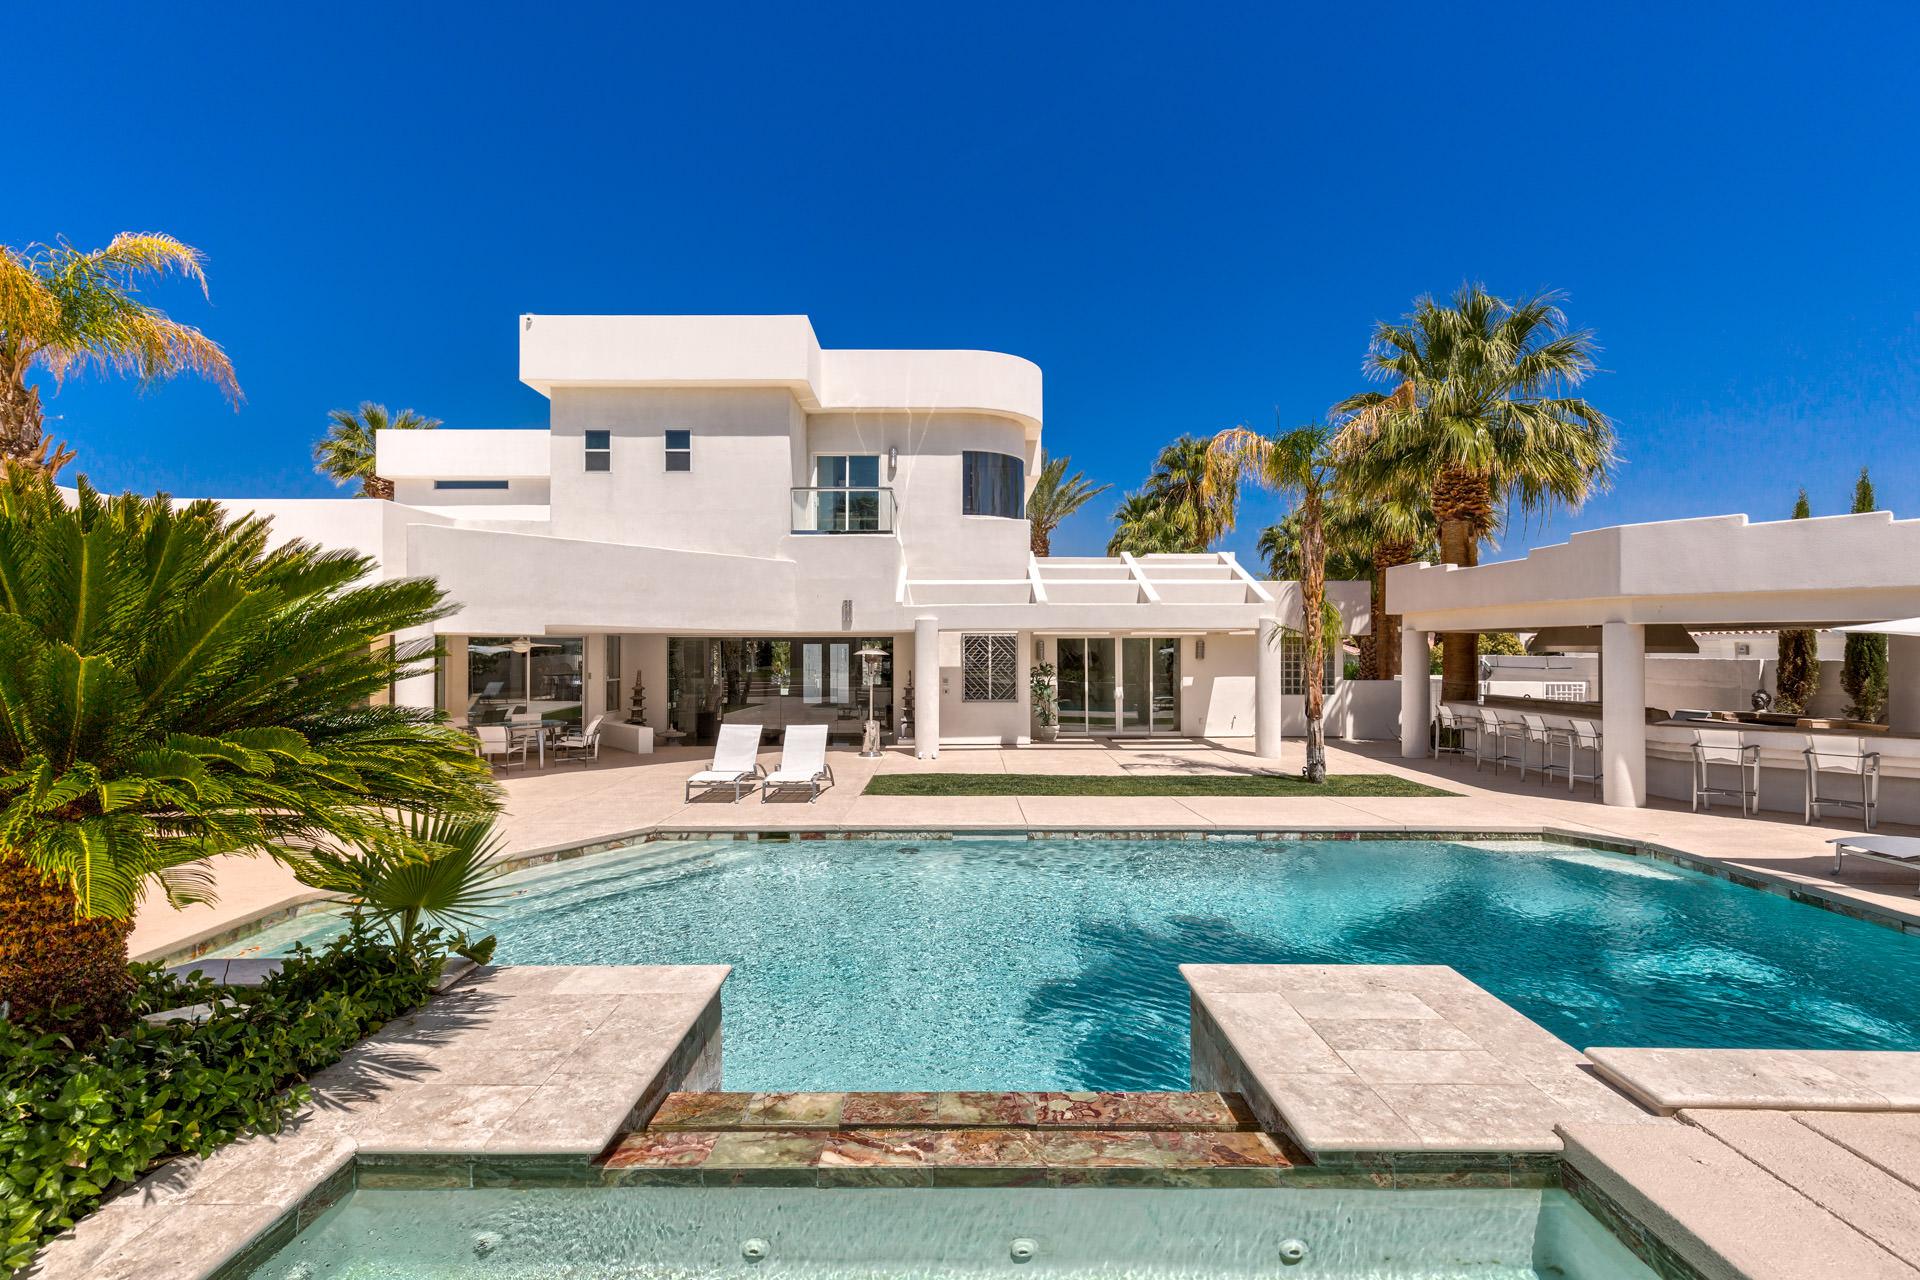 Million dollar homes in las vegas for sale 1m 3m for 10 million dollar homes